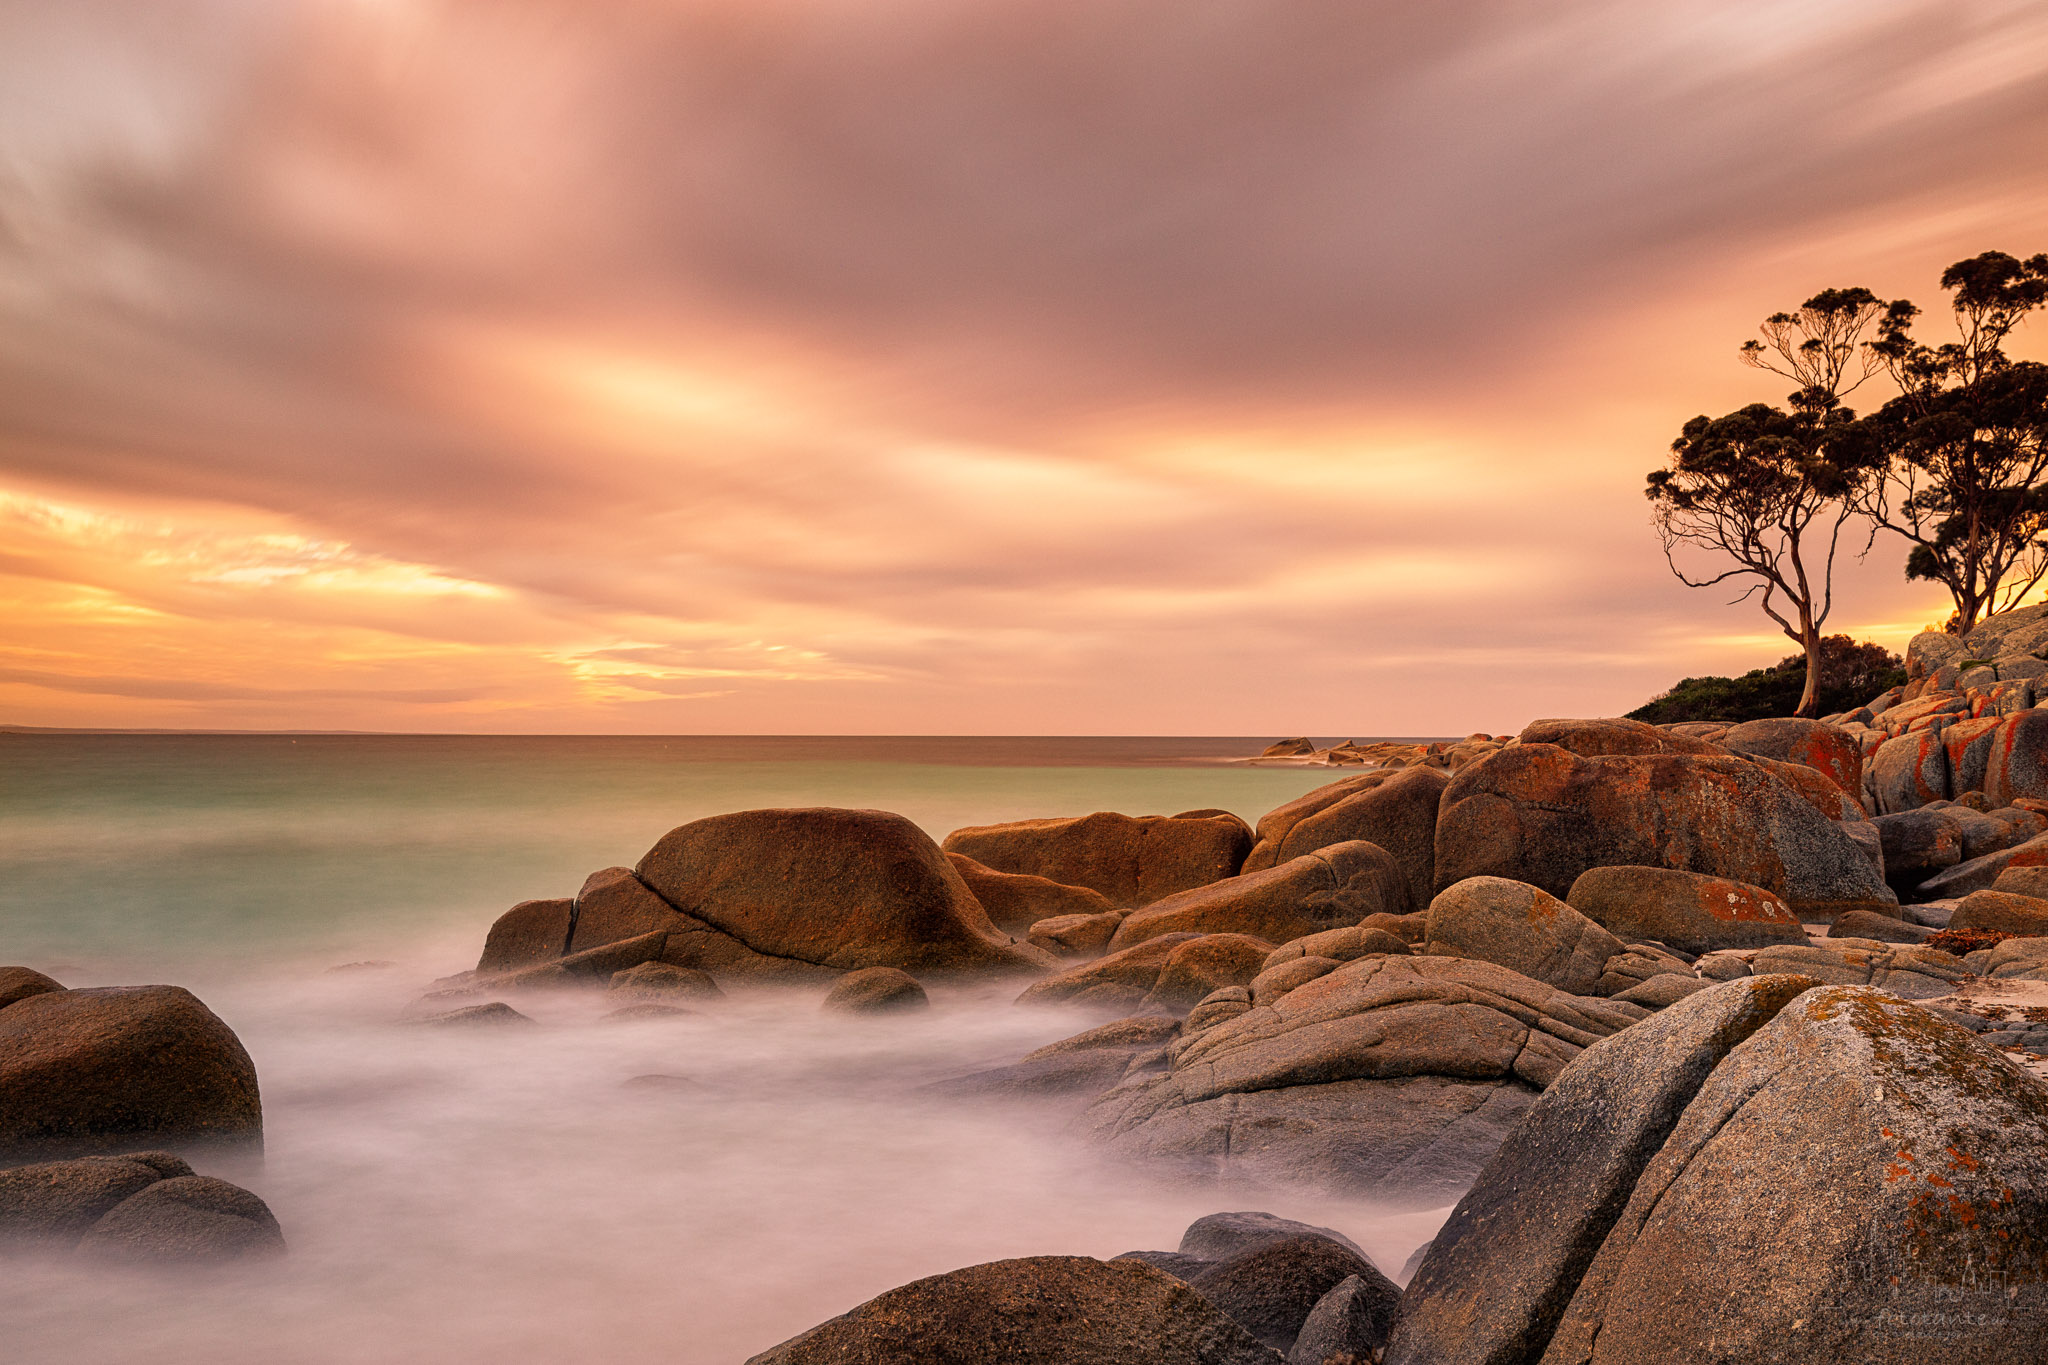 Binalong Bay sunrise, Tasmania, Australia, Australia